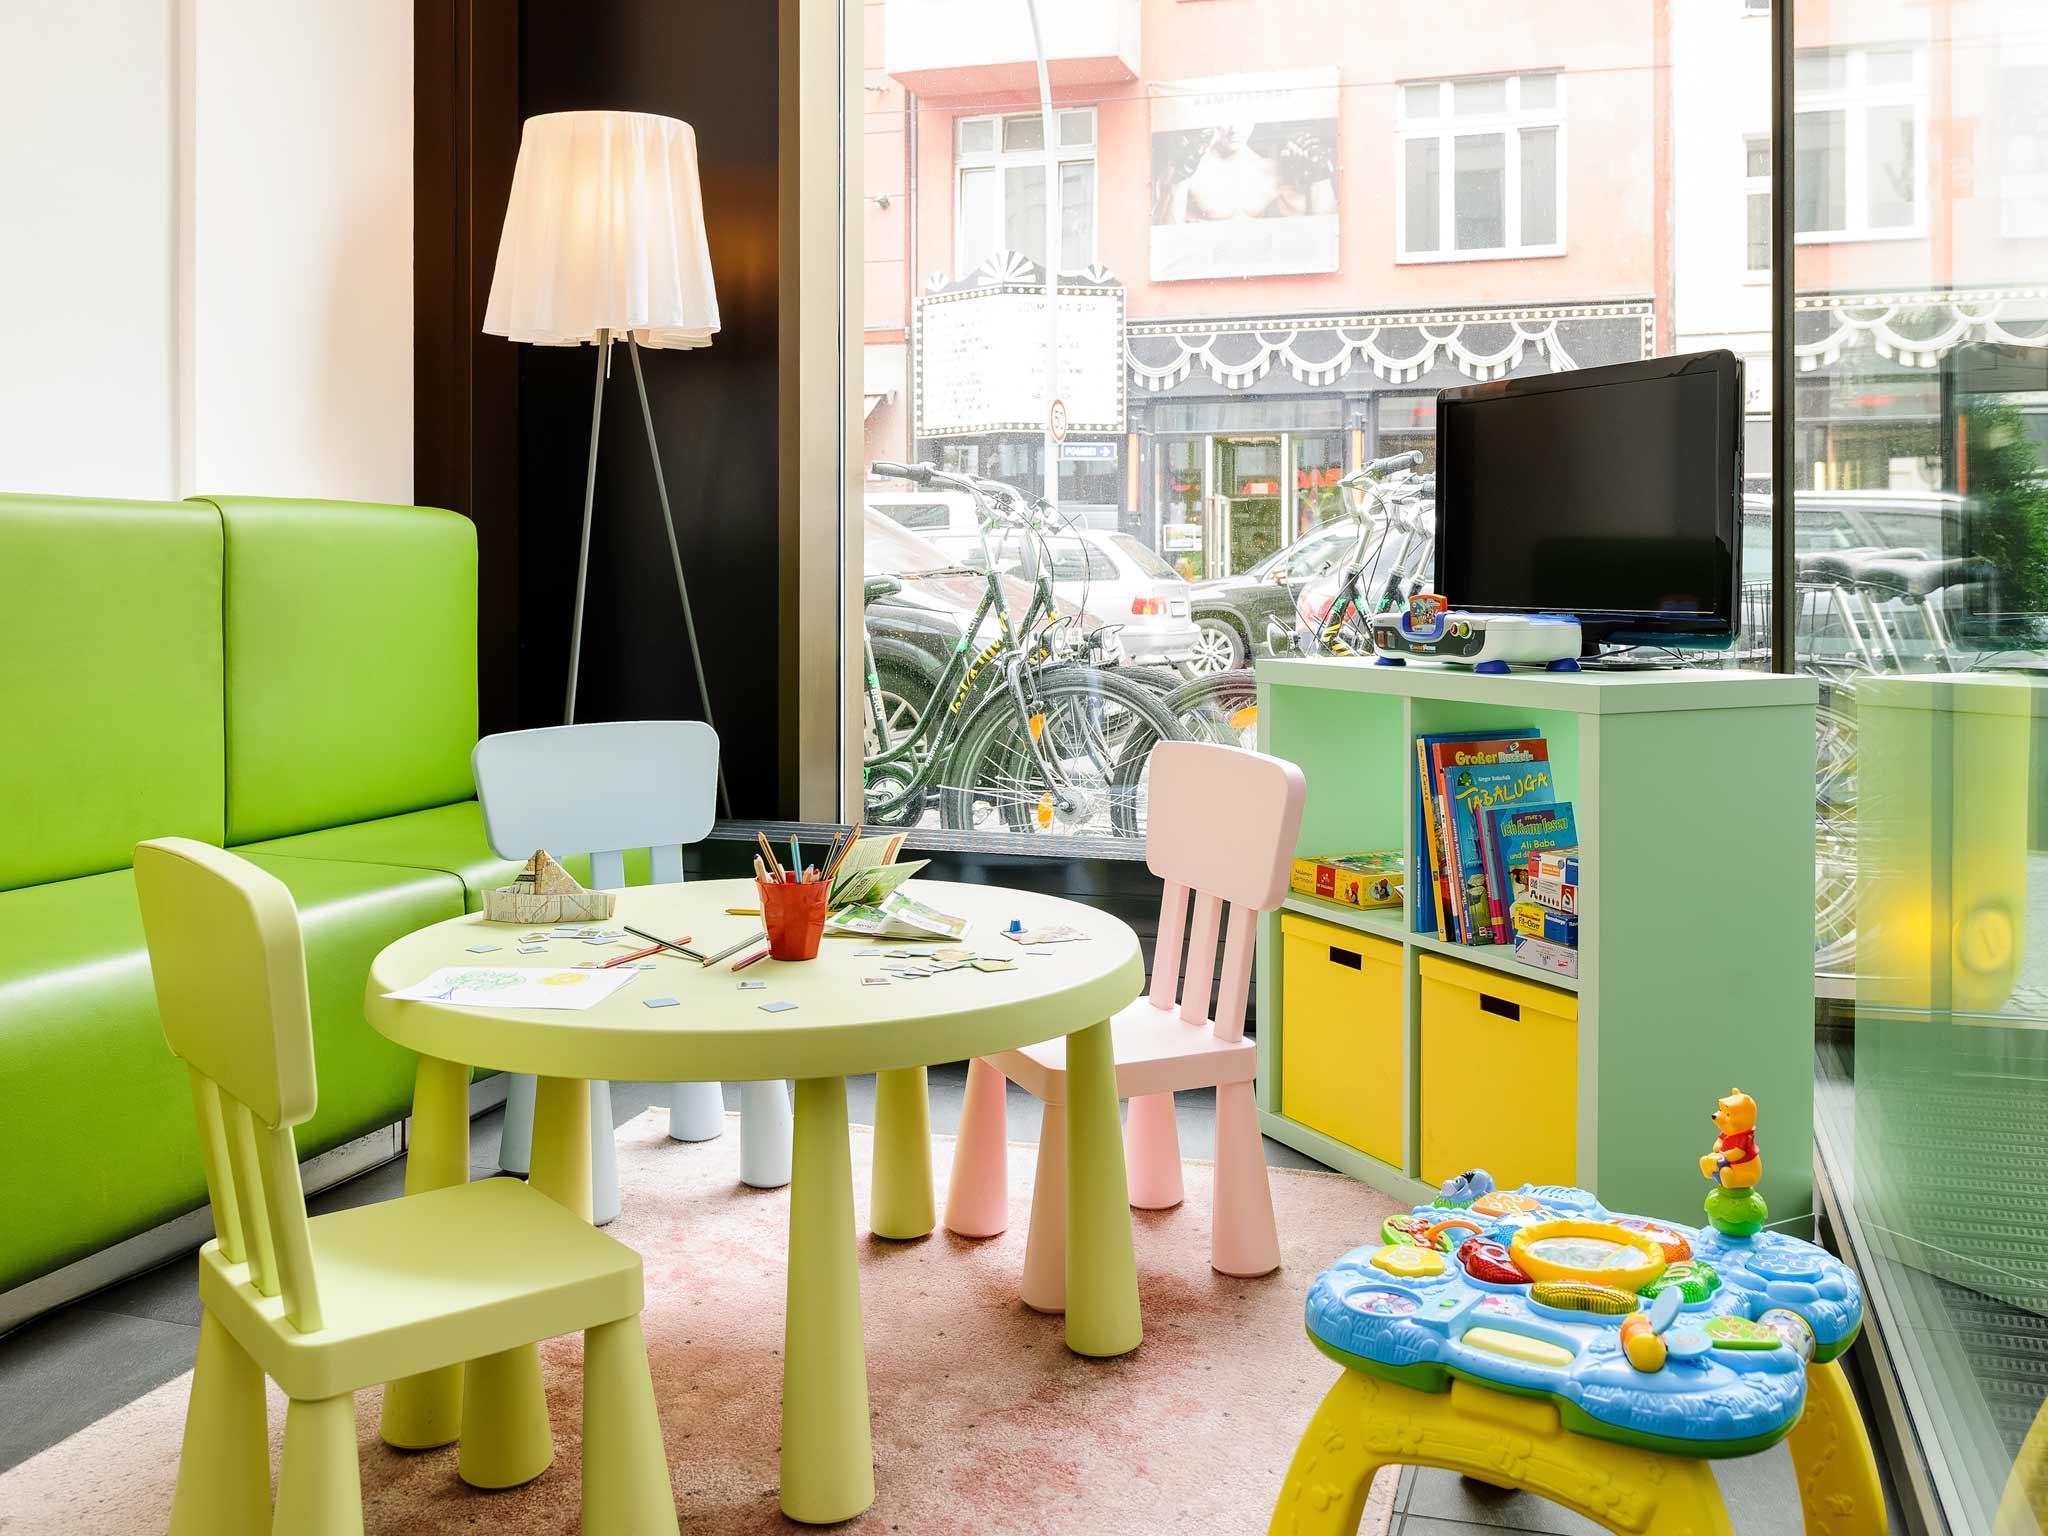 ibis Styles Hotel Berlin Mitte Centrum rekreacyjne